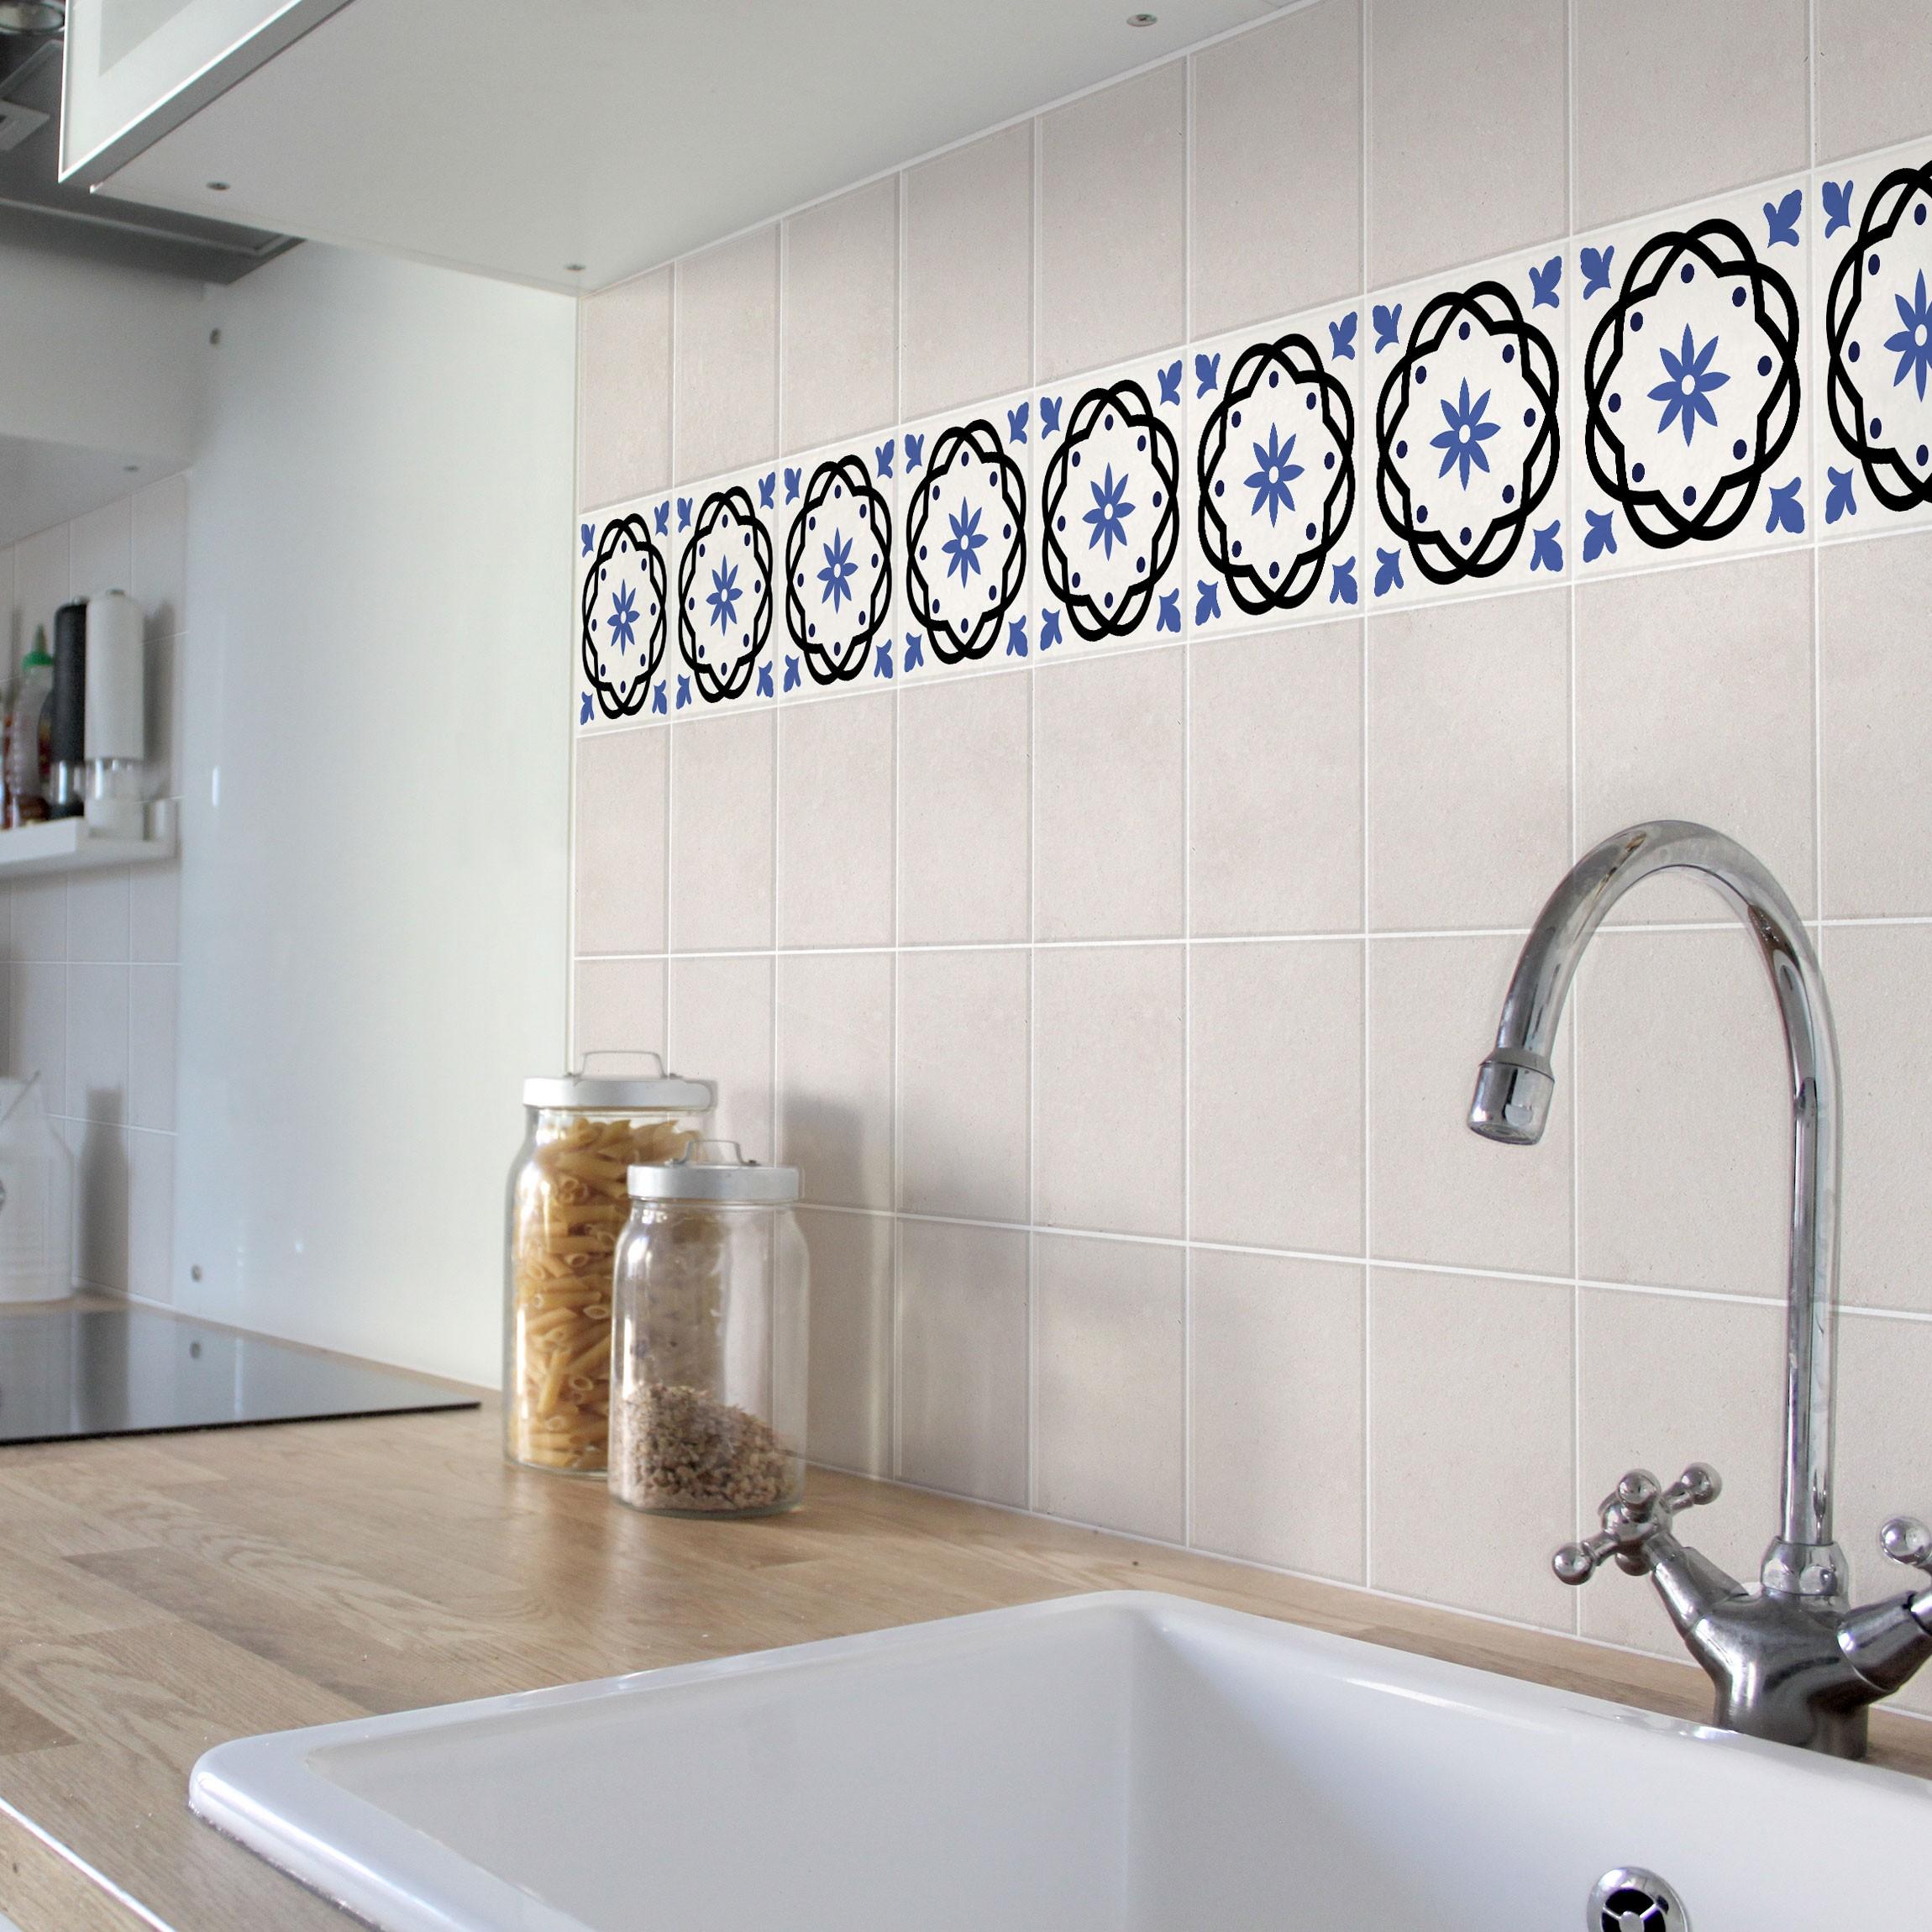 fliesen bord re portugiesische fliese cr me 20cm x 20cm fliesenaufkleber. Black Bedroom Furniture Sets. Home Design Ideas